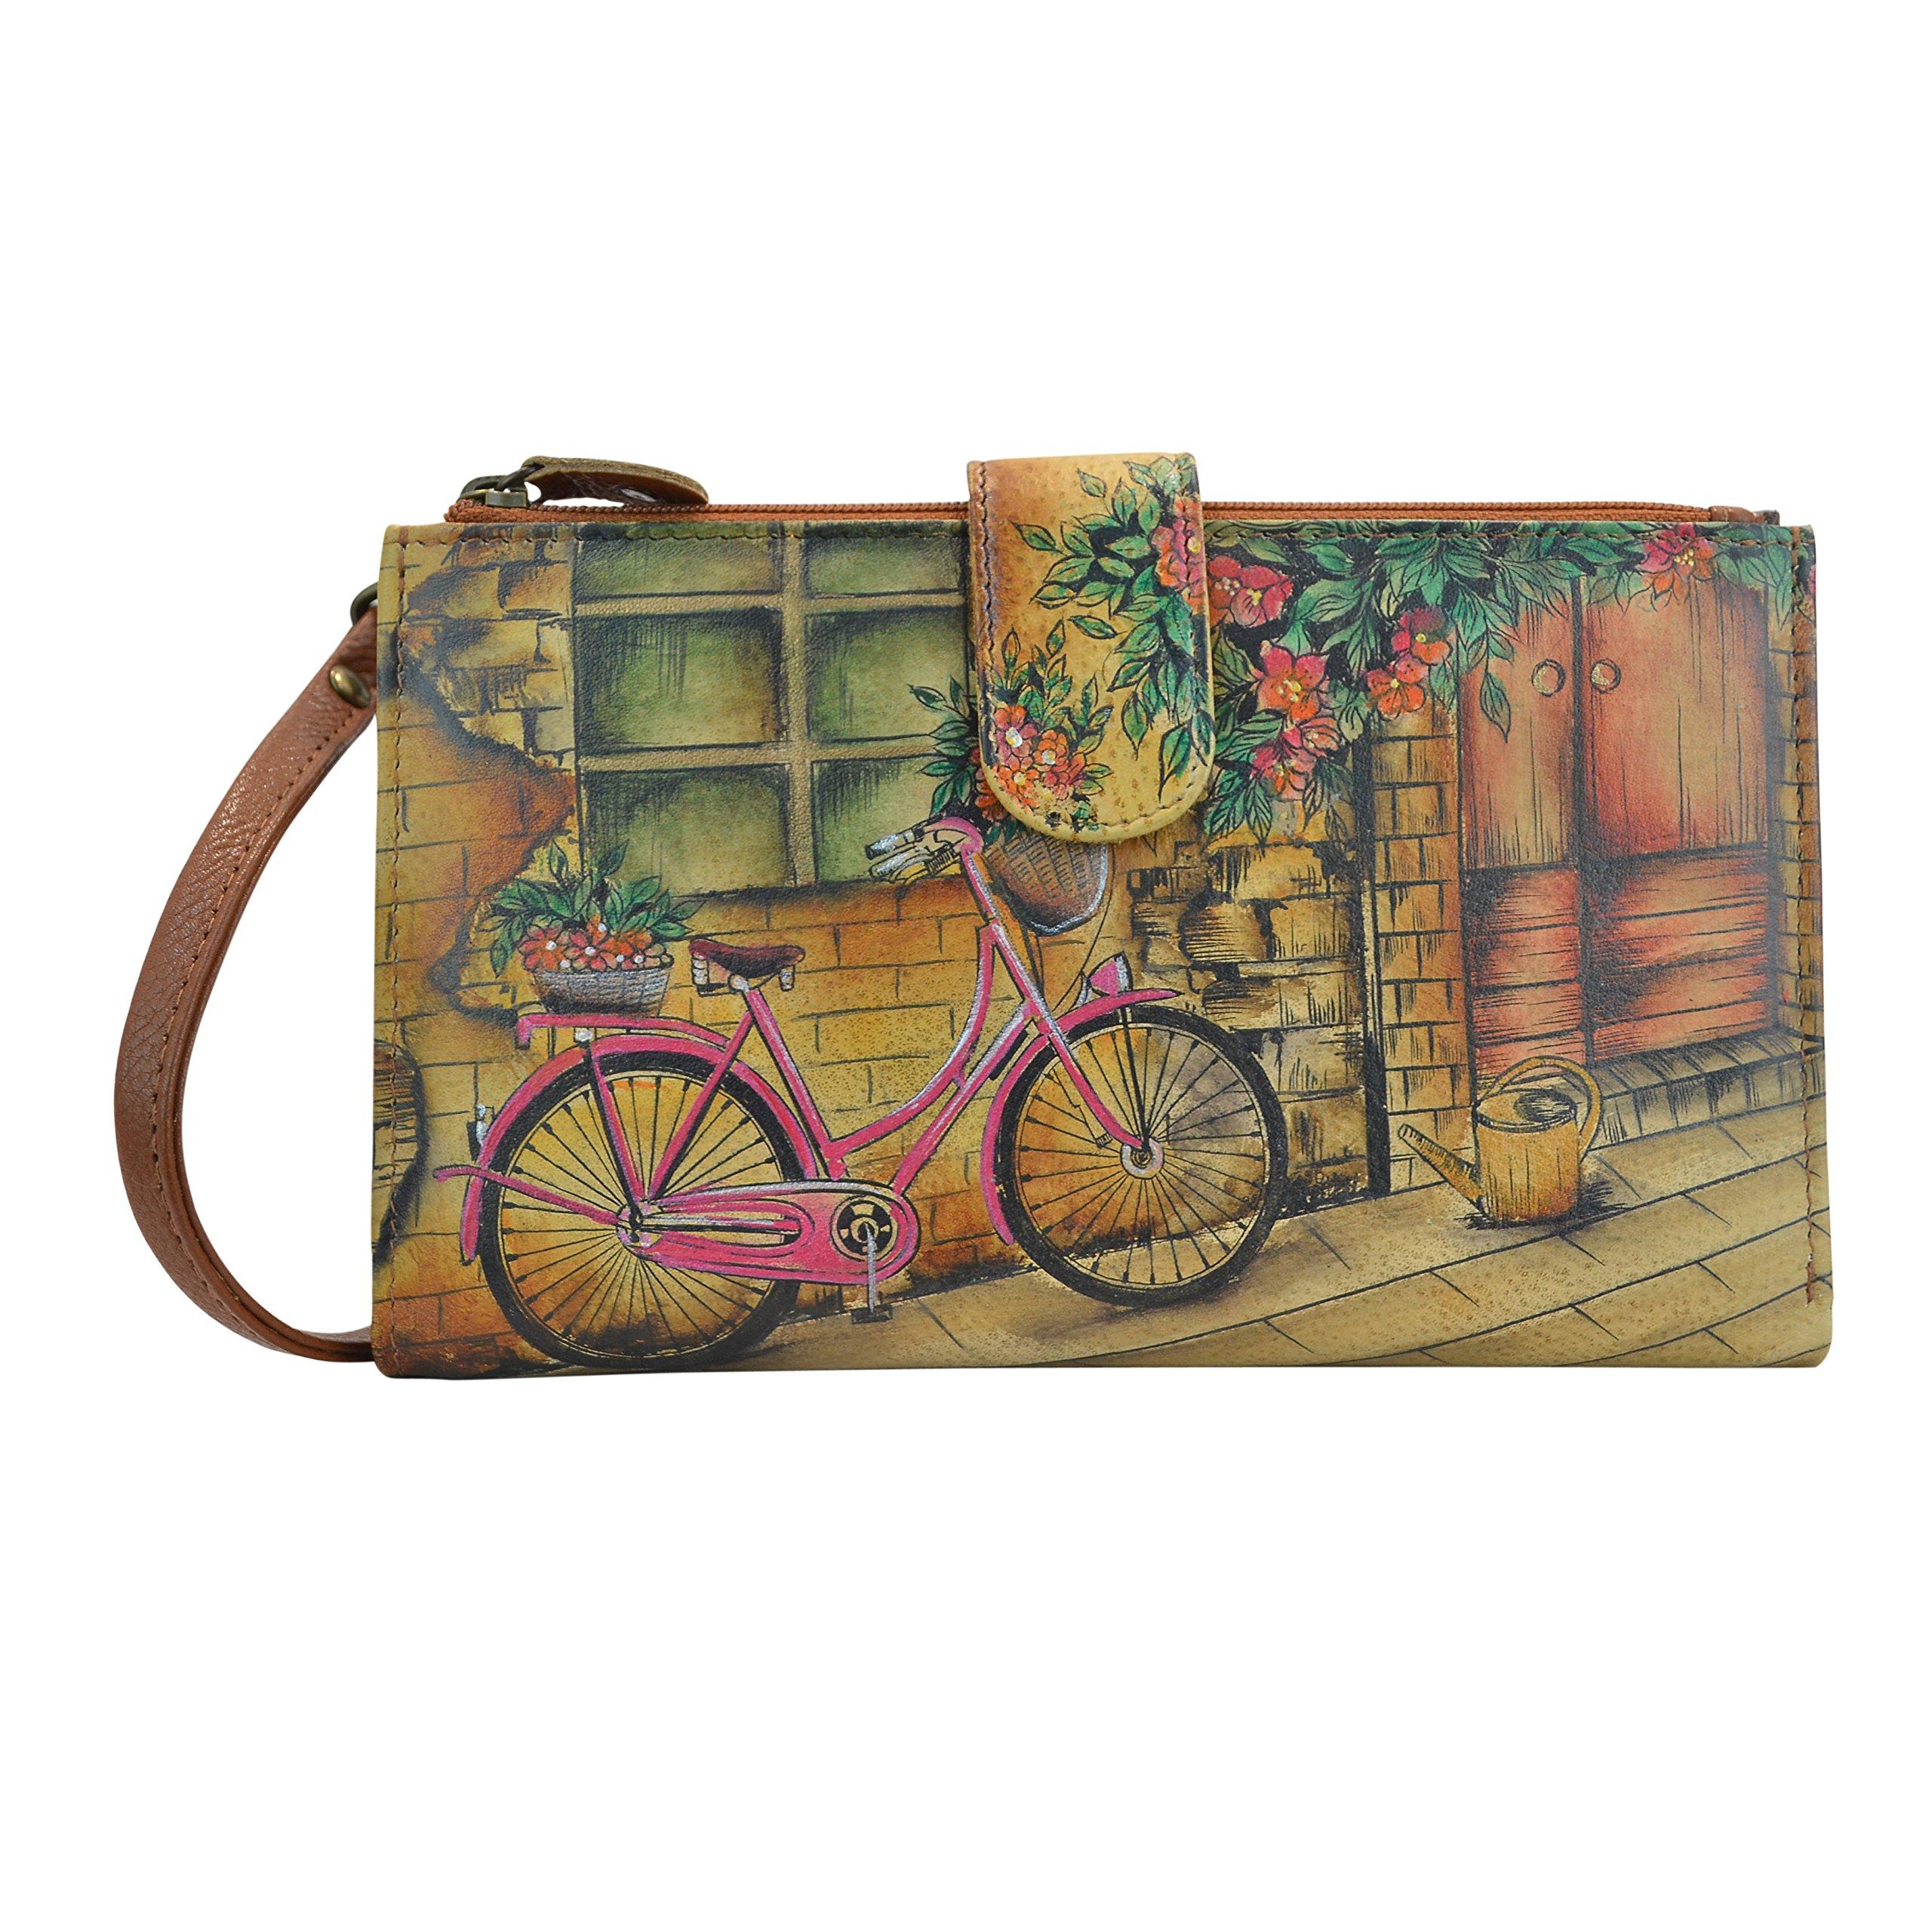 Anuschka Handpainted Leather Large Smartphonecase & Wallet-vintage Bike Wallet, VINTAGE BIKE, One Size